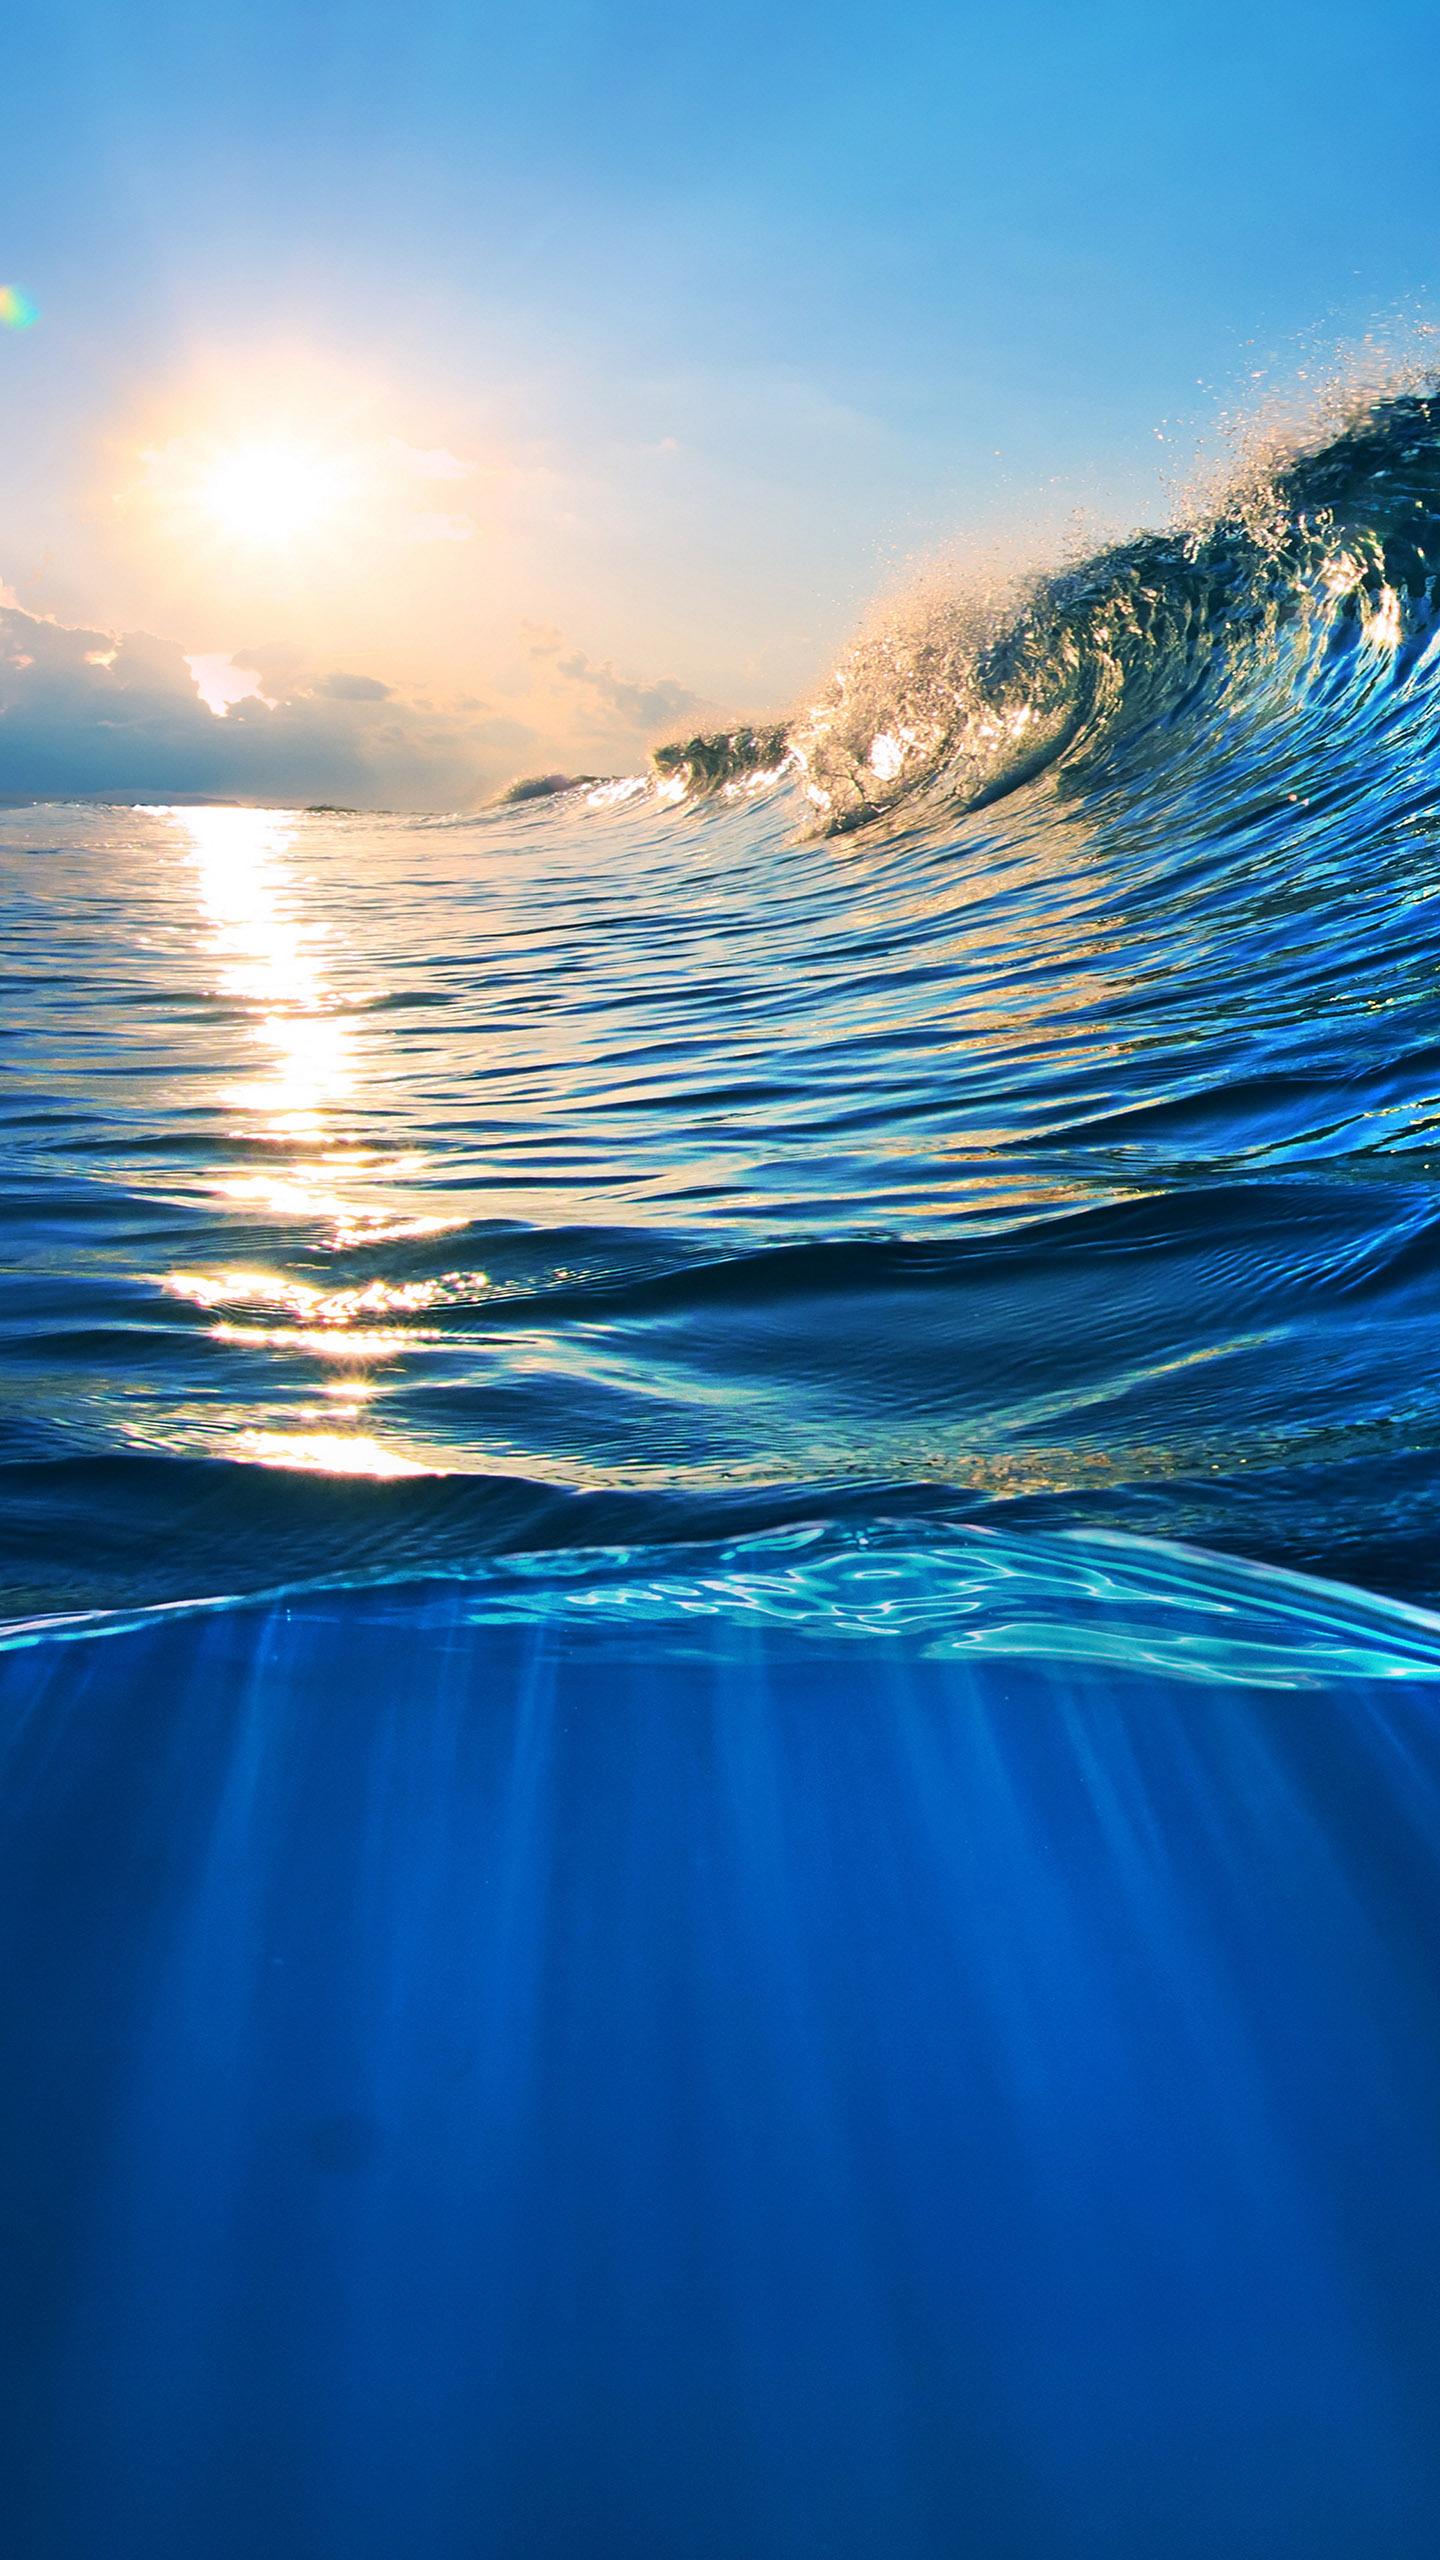 Ocean Wave Wallpapers For Galaxy S7 - Splash Of Water Sea , HD Wallpaper & Backgrounds